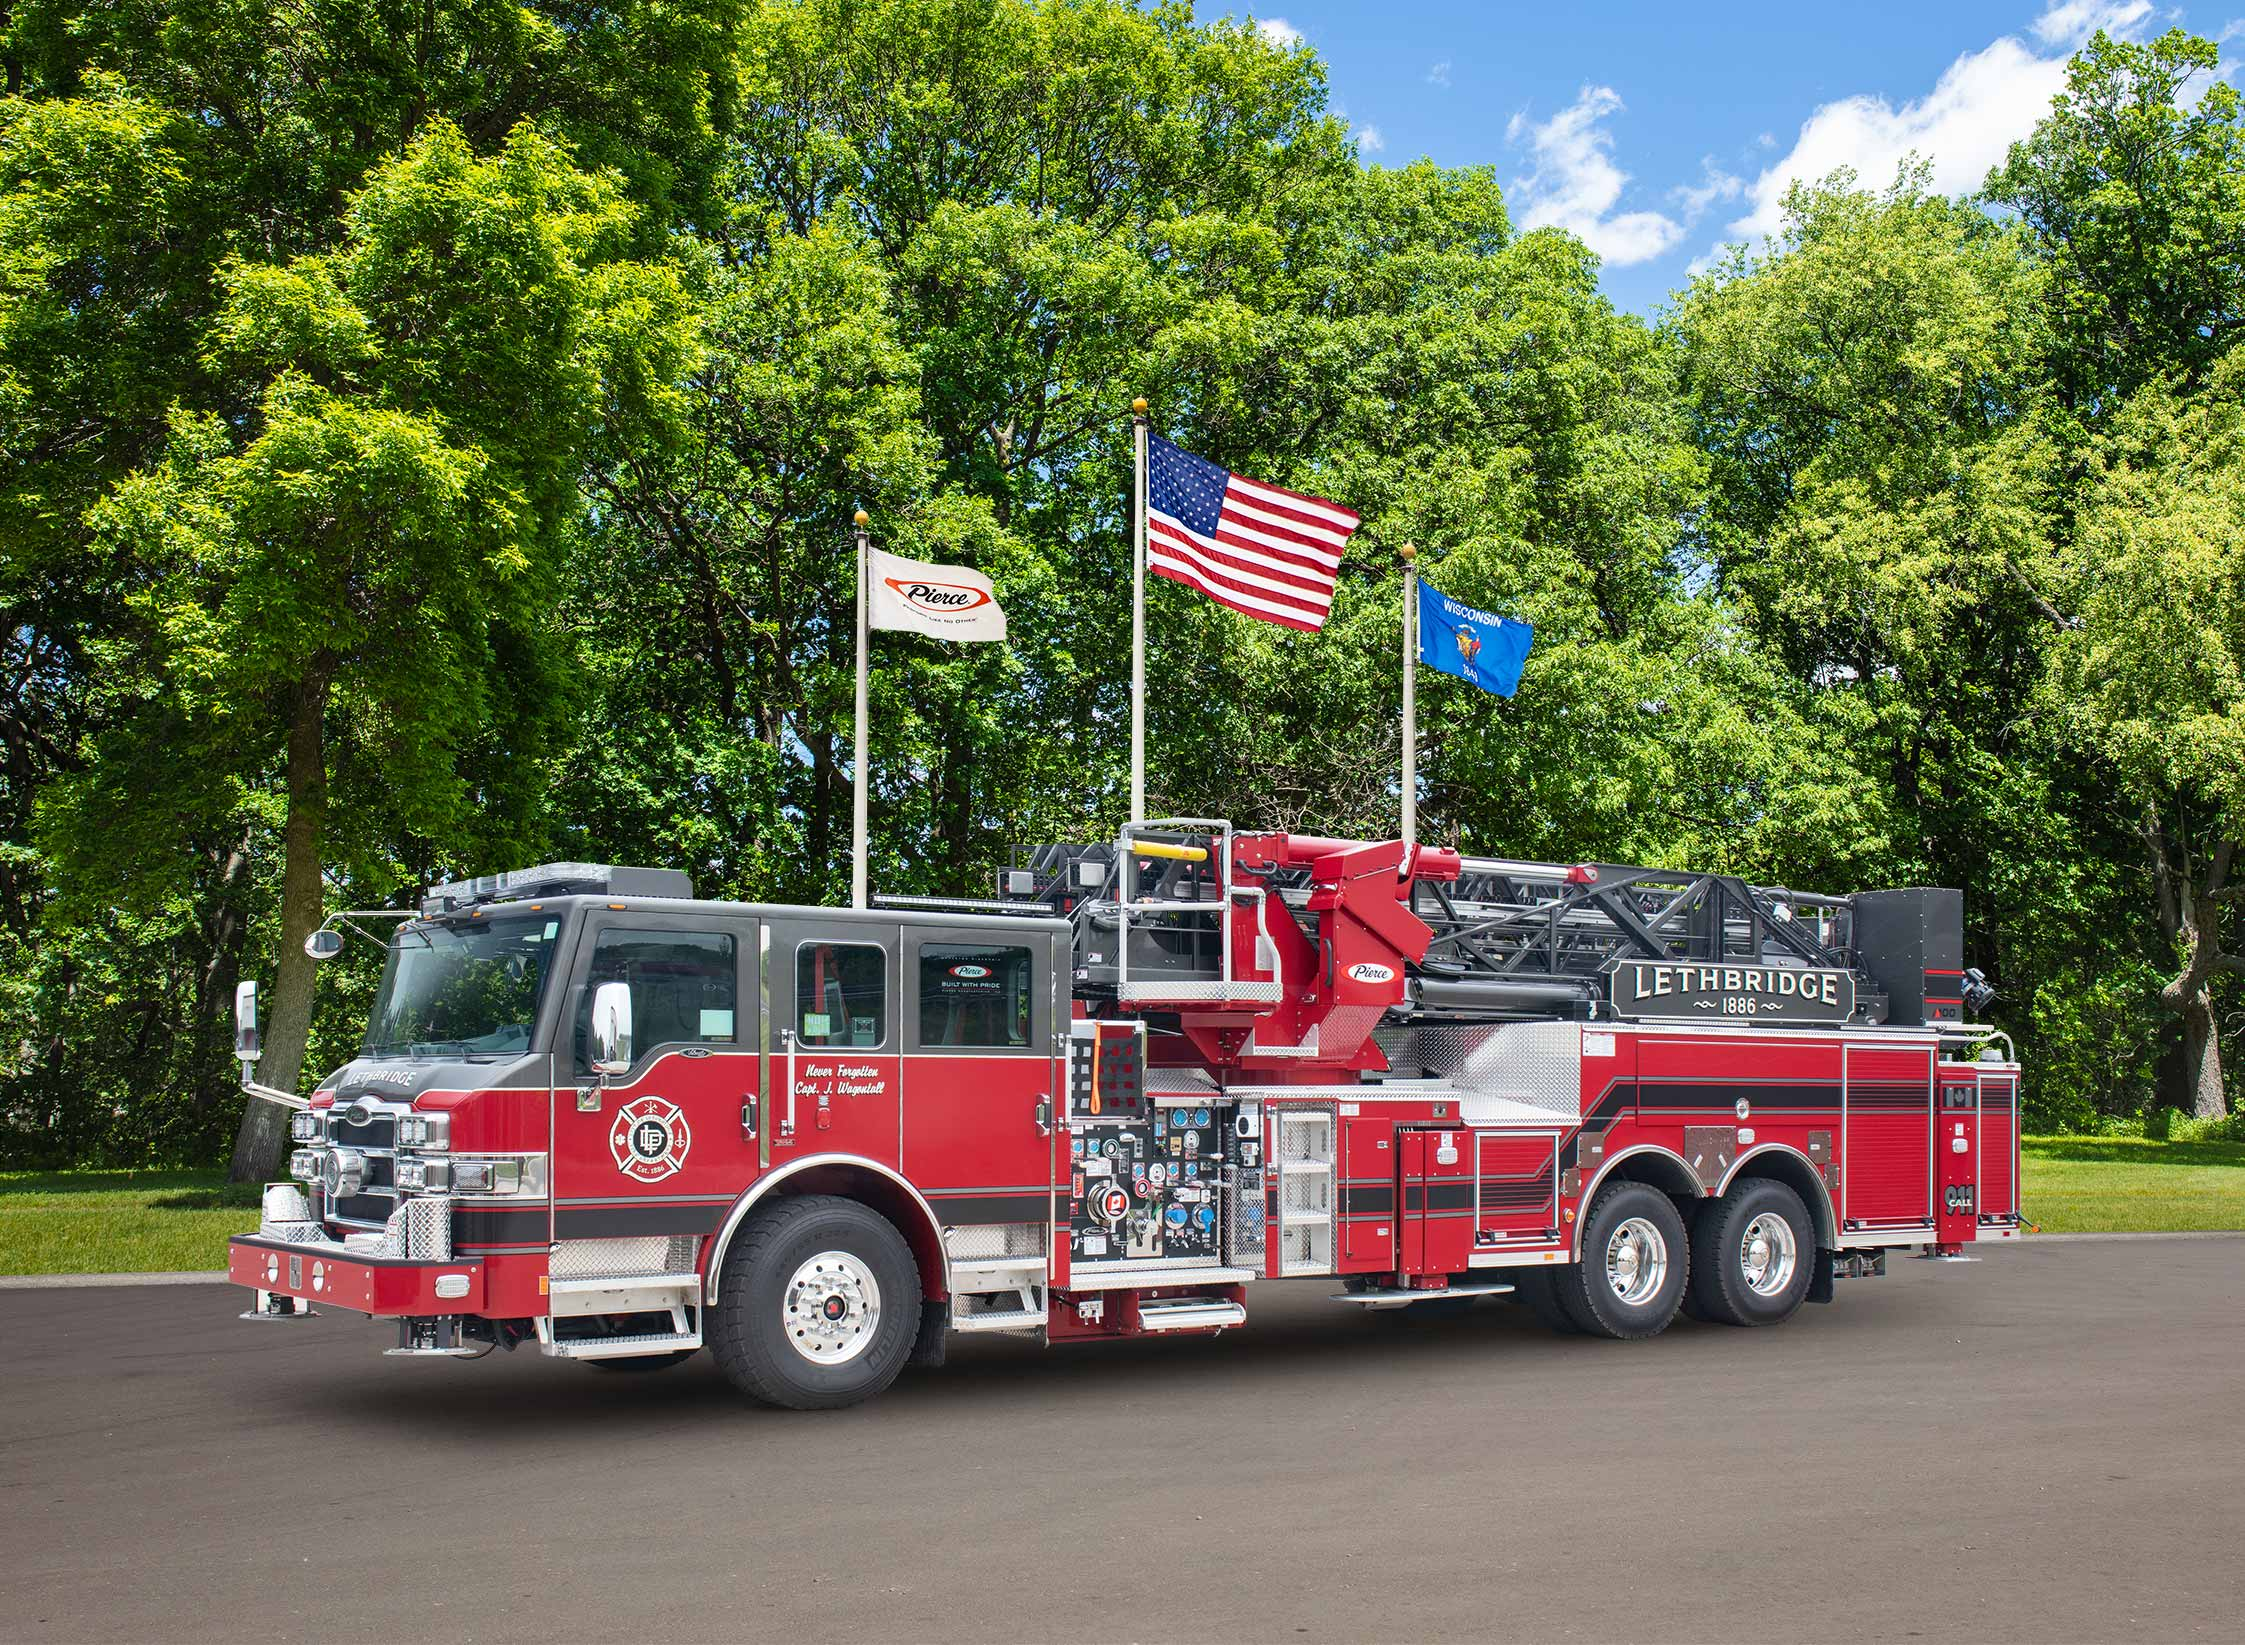 Lethbridge Fire Department - Aerial